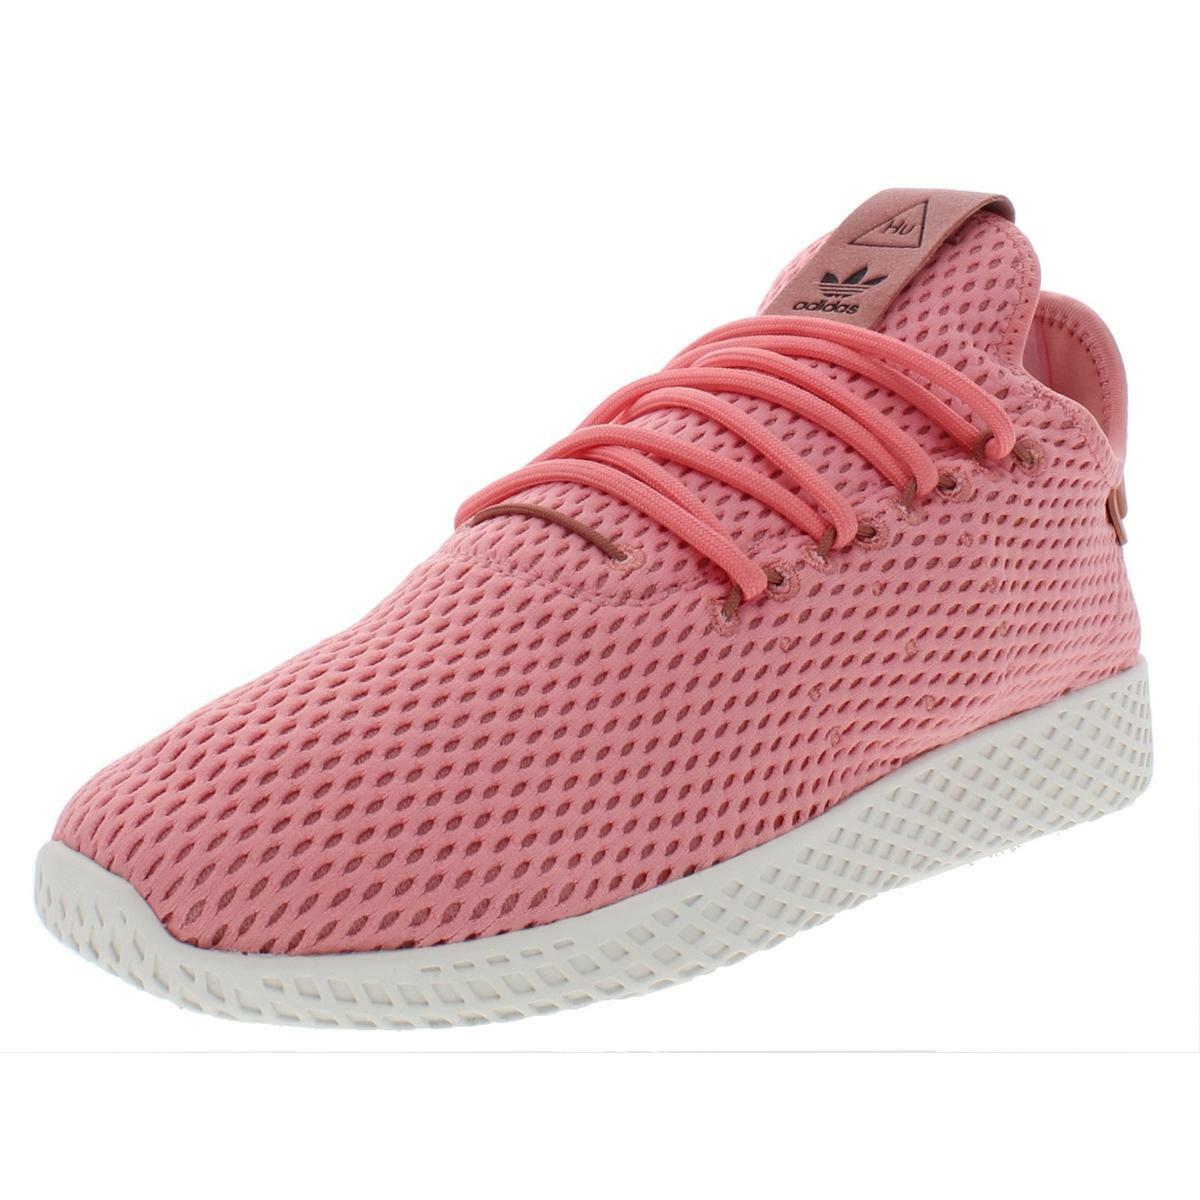 474dcae8d6e Adidas Originals Mens PW Tennis HU Running Mesh Tennis shoes Sneakers BHFO  4318